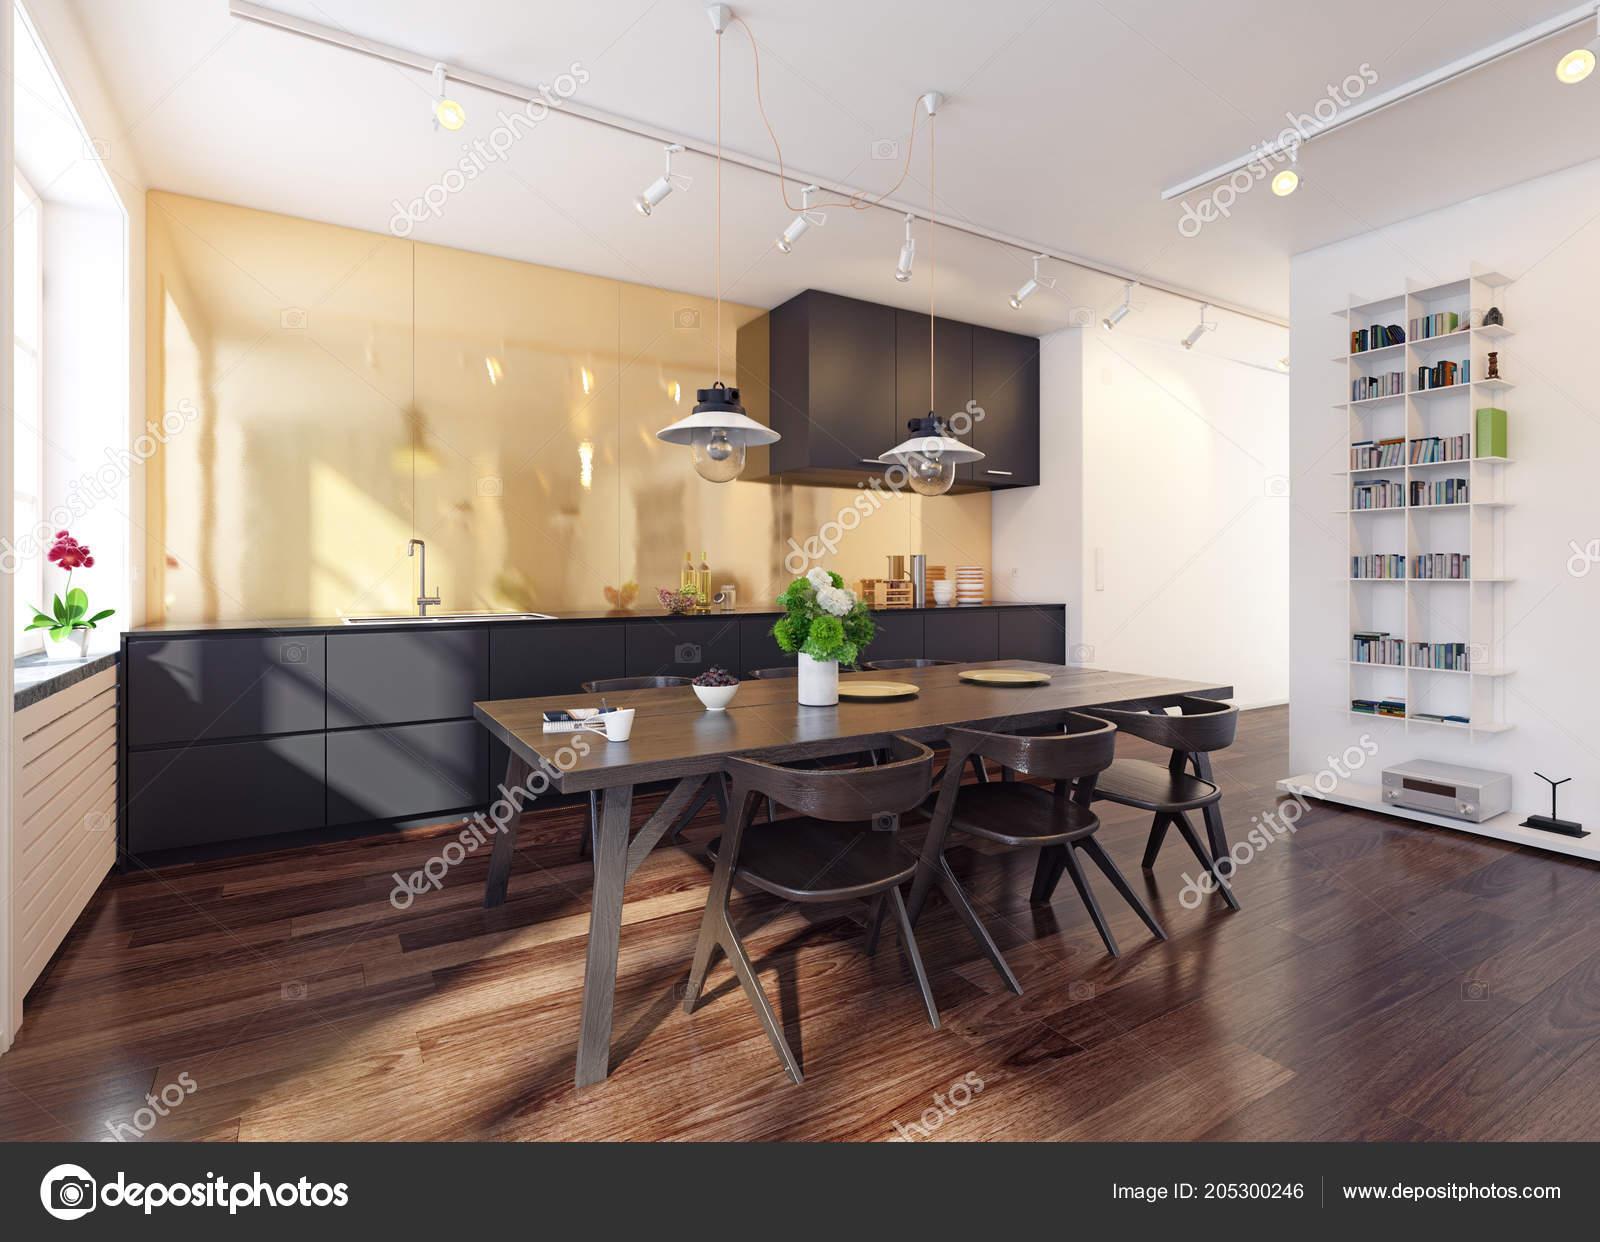 Cucina Moderna Rendering Interni Concetto Design Contemporaneo ...